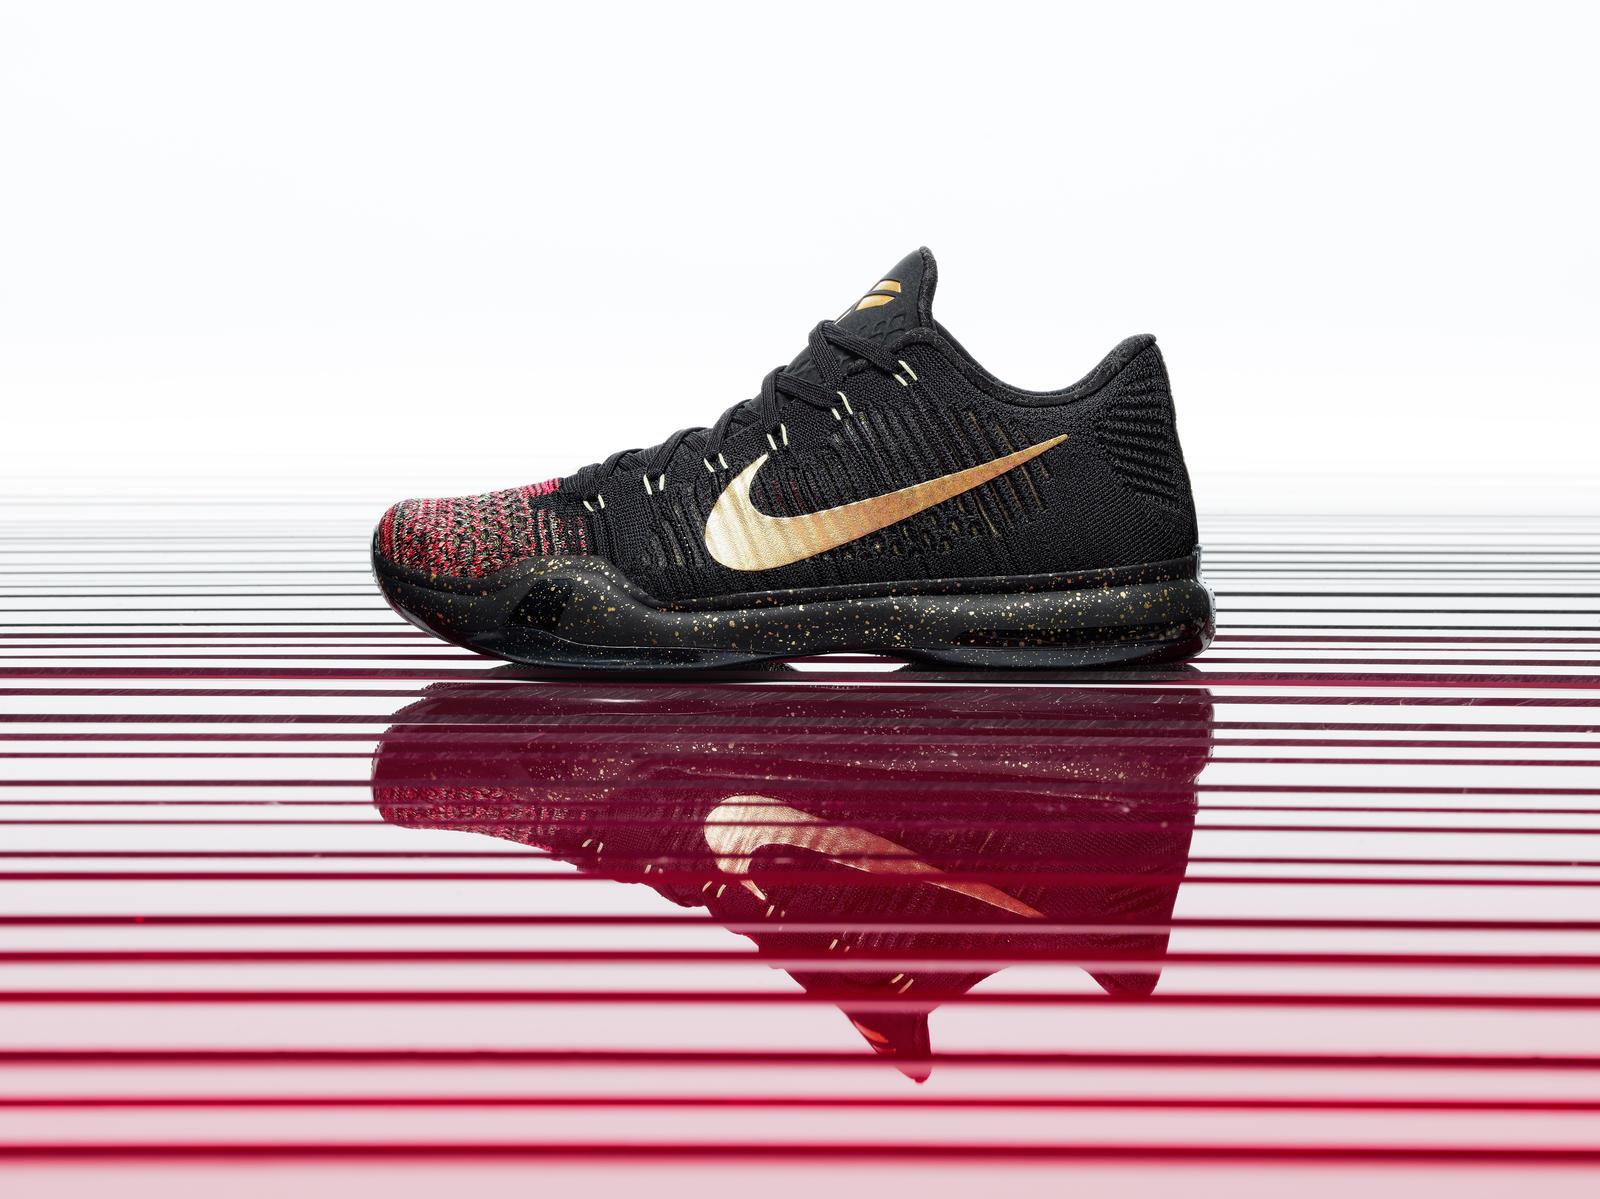 Nike Kobe 10 Christmas Pack